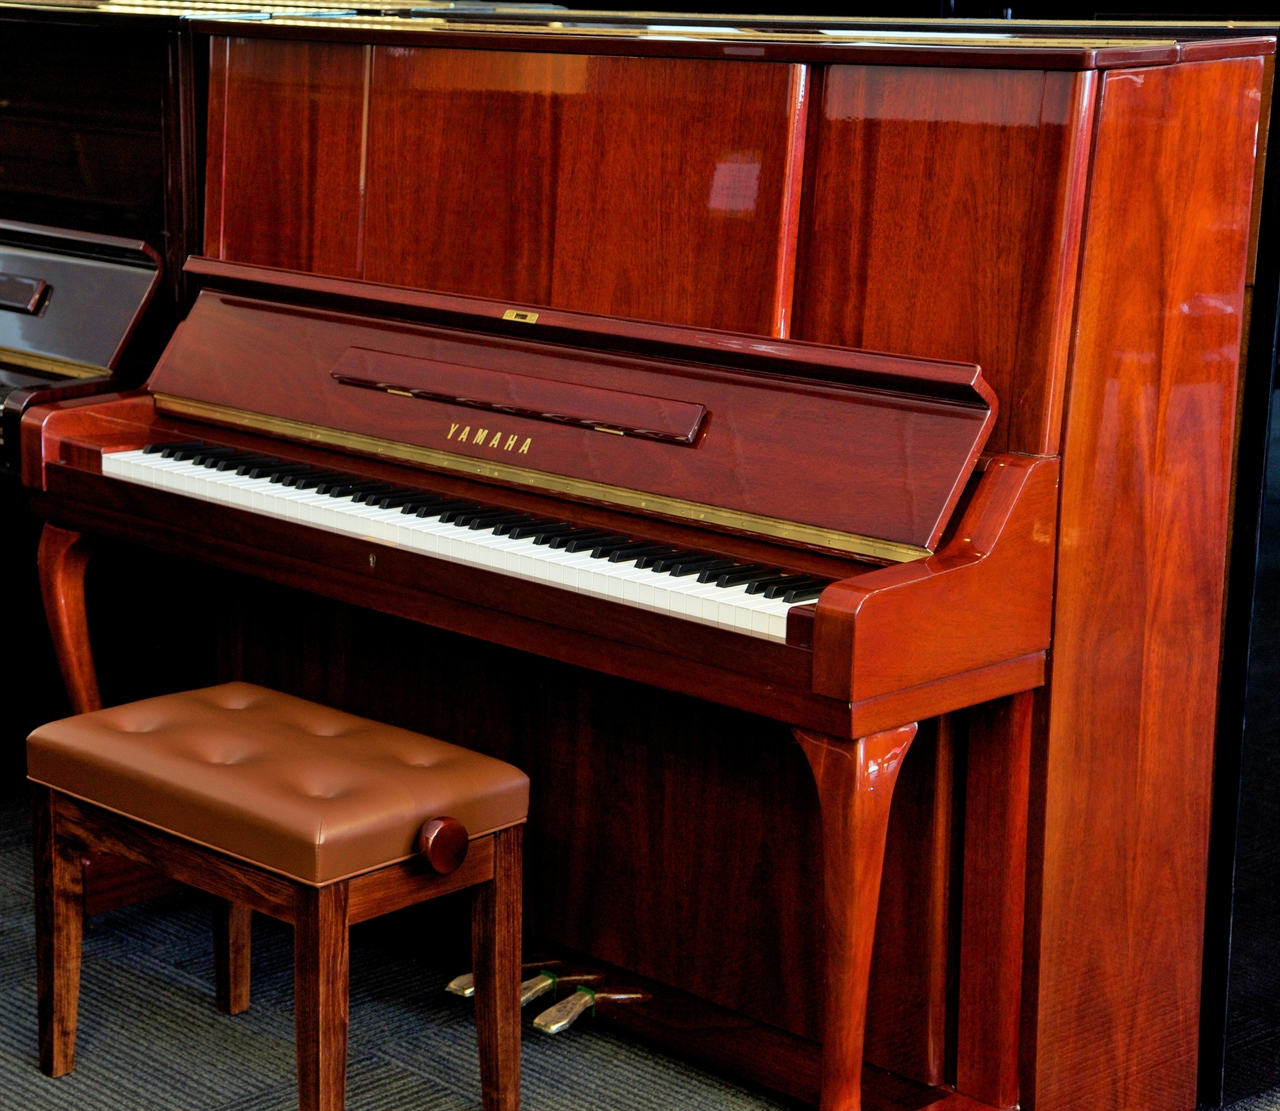 piano cơ yamaha w106